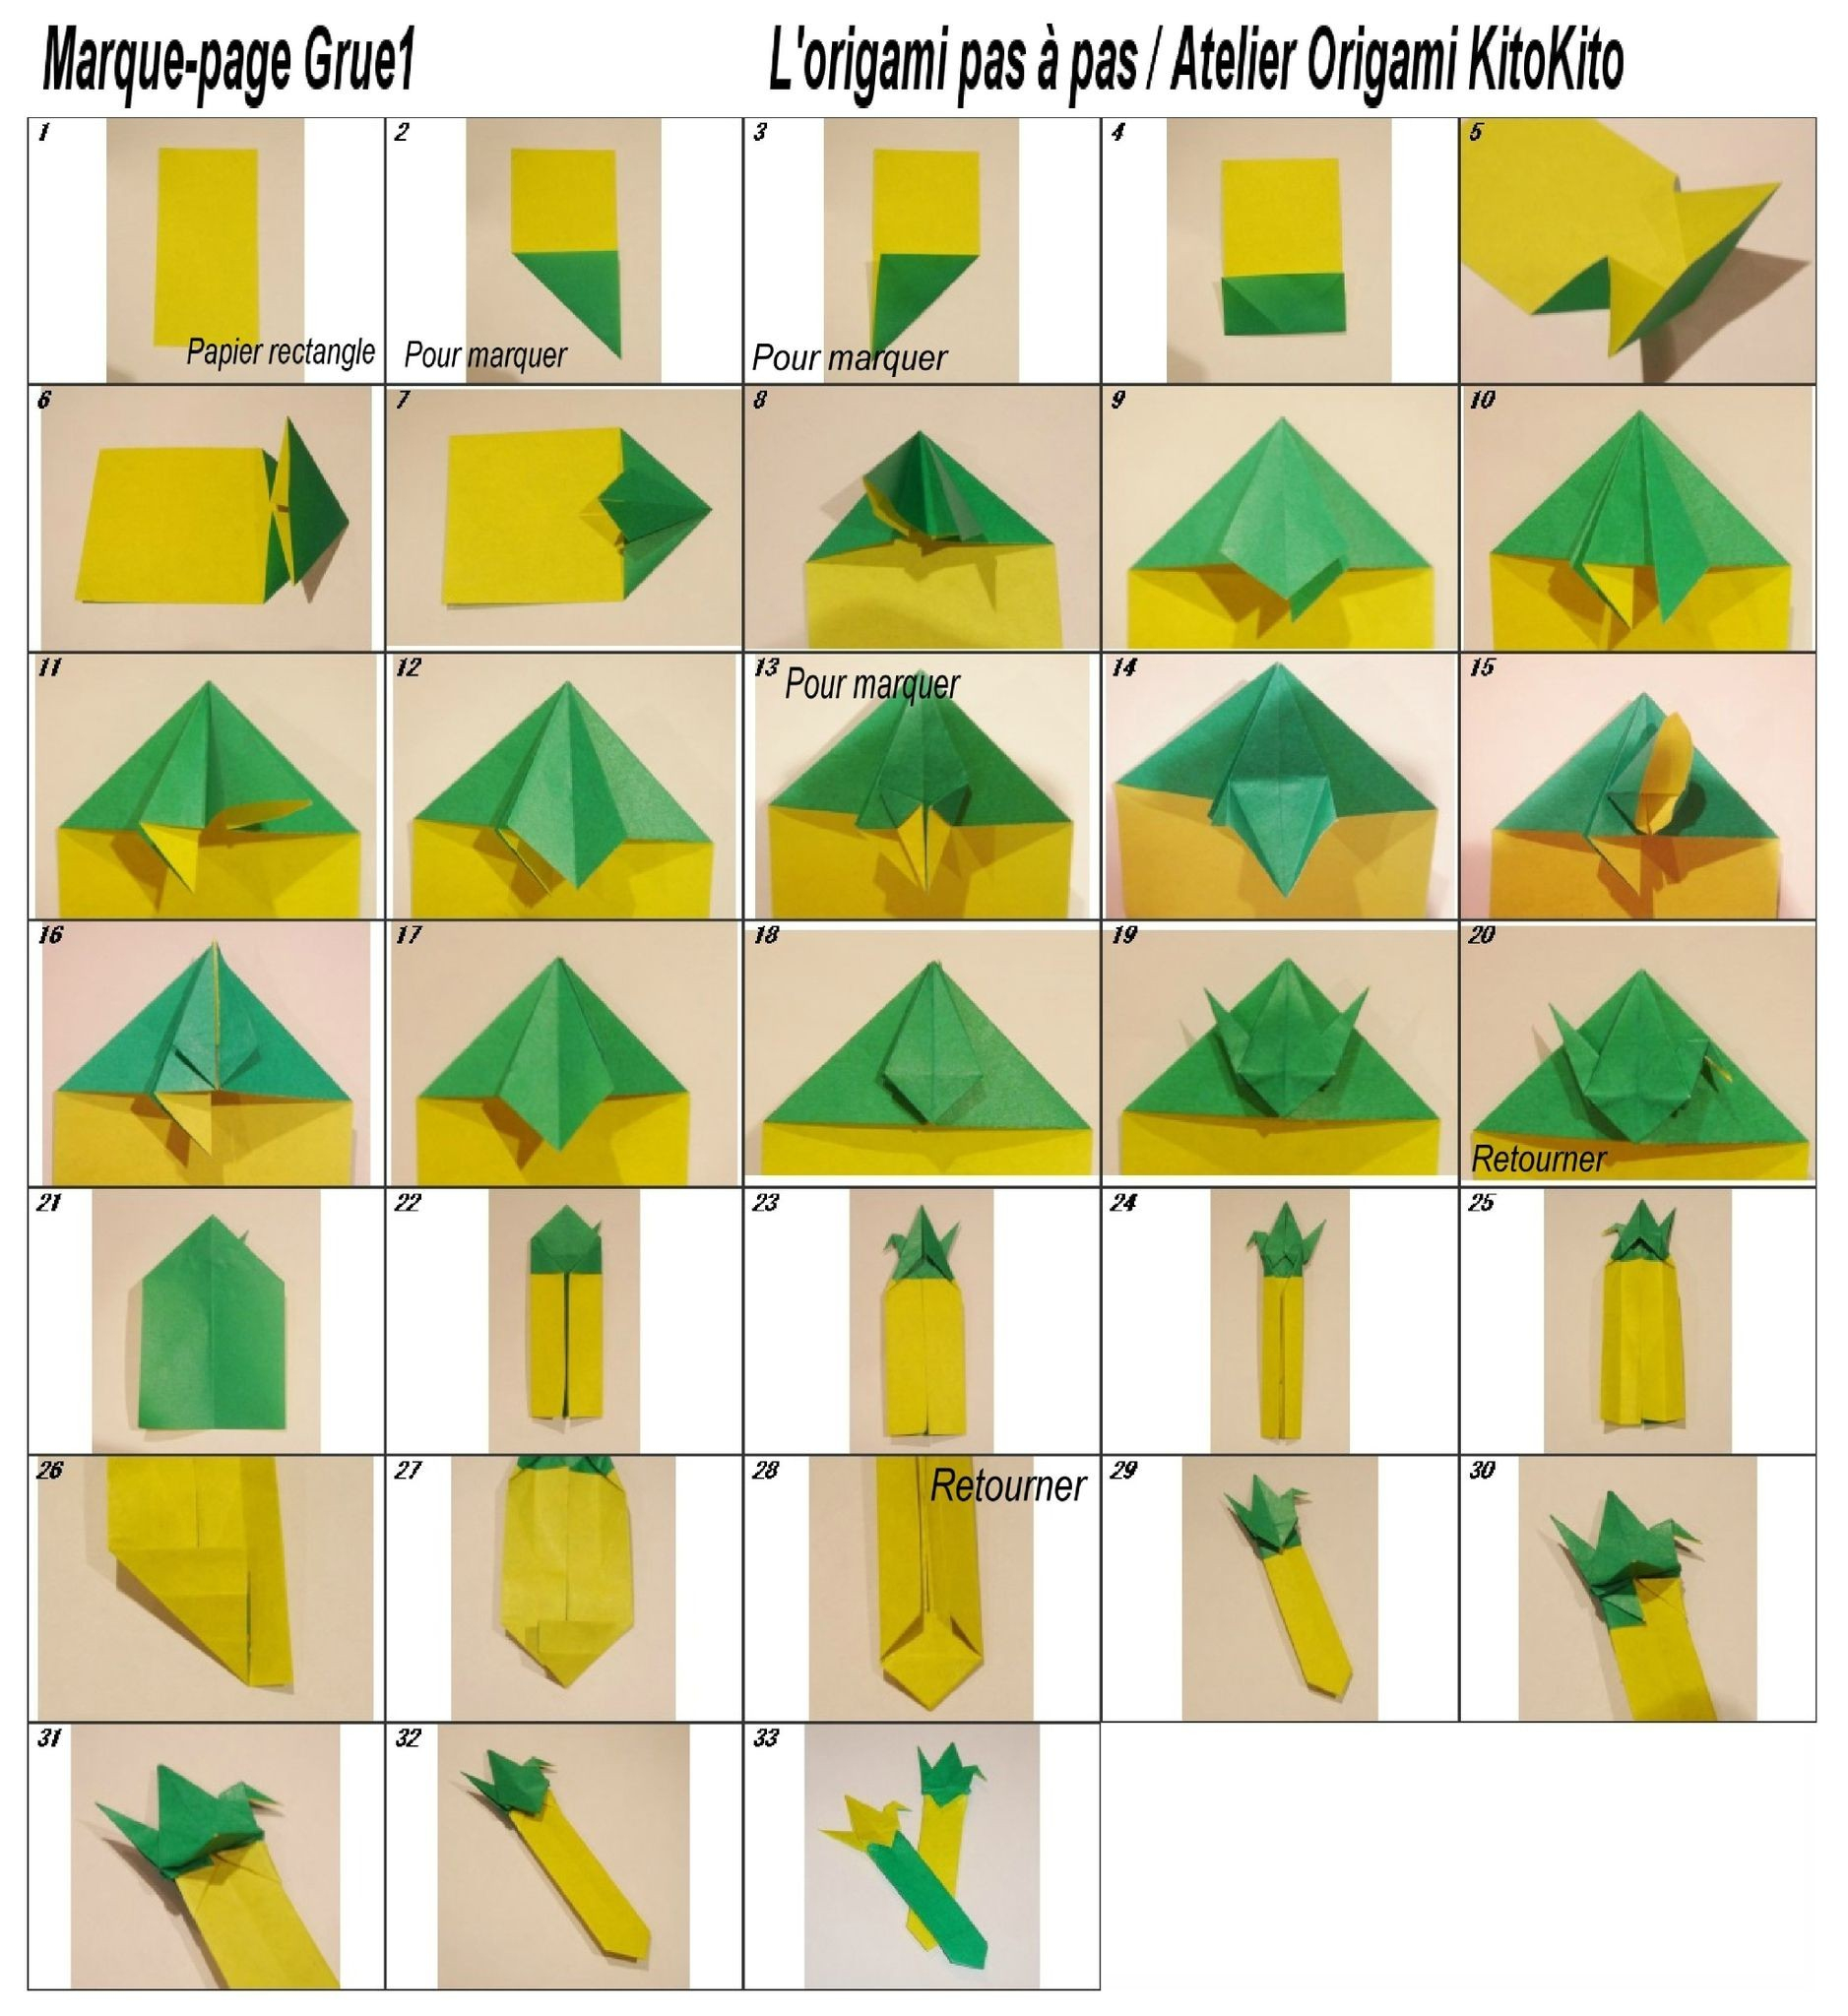 Lovely Modele Origami Facile A Imprimer tout Modele De Marque Page A Imprimer